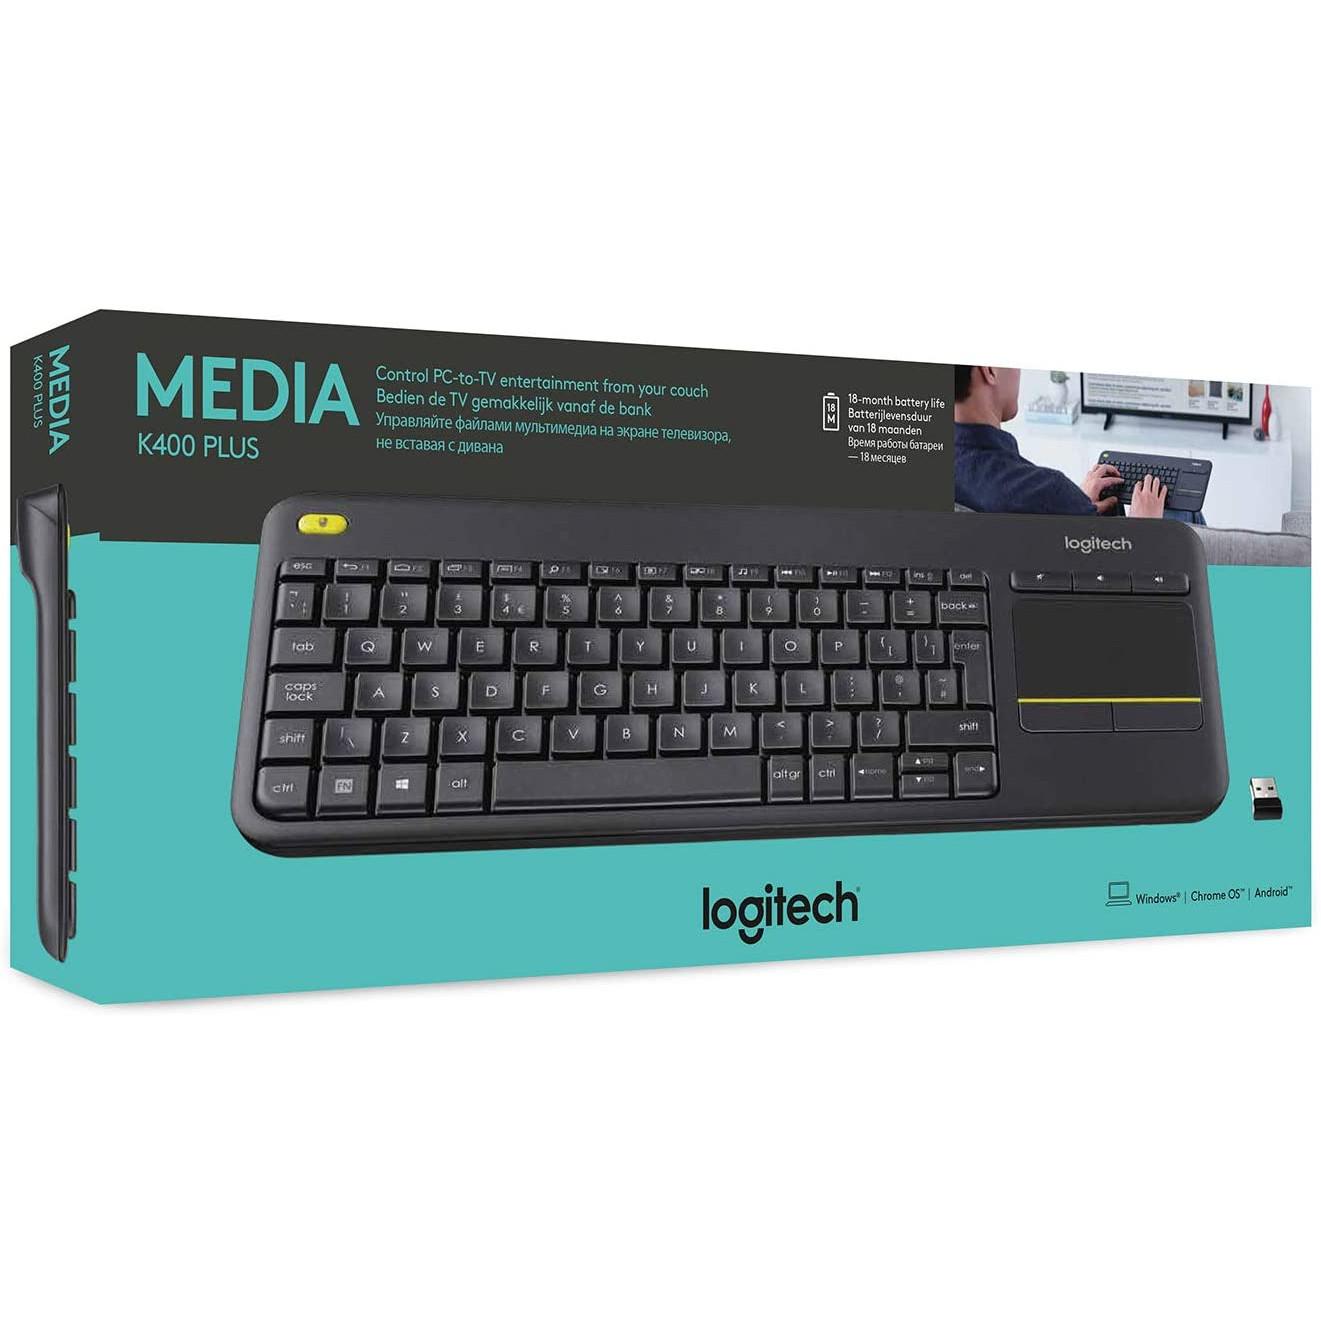 Logitech-K400-Plus-Wireless-Touch-HTPC-Keyboard-Media-Friendly-TV-All-Colours-VS thumbnail 4